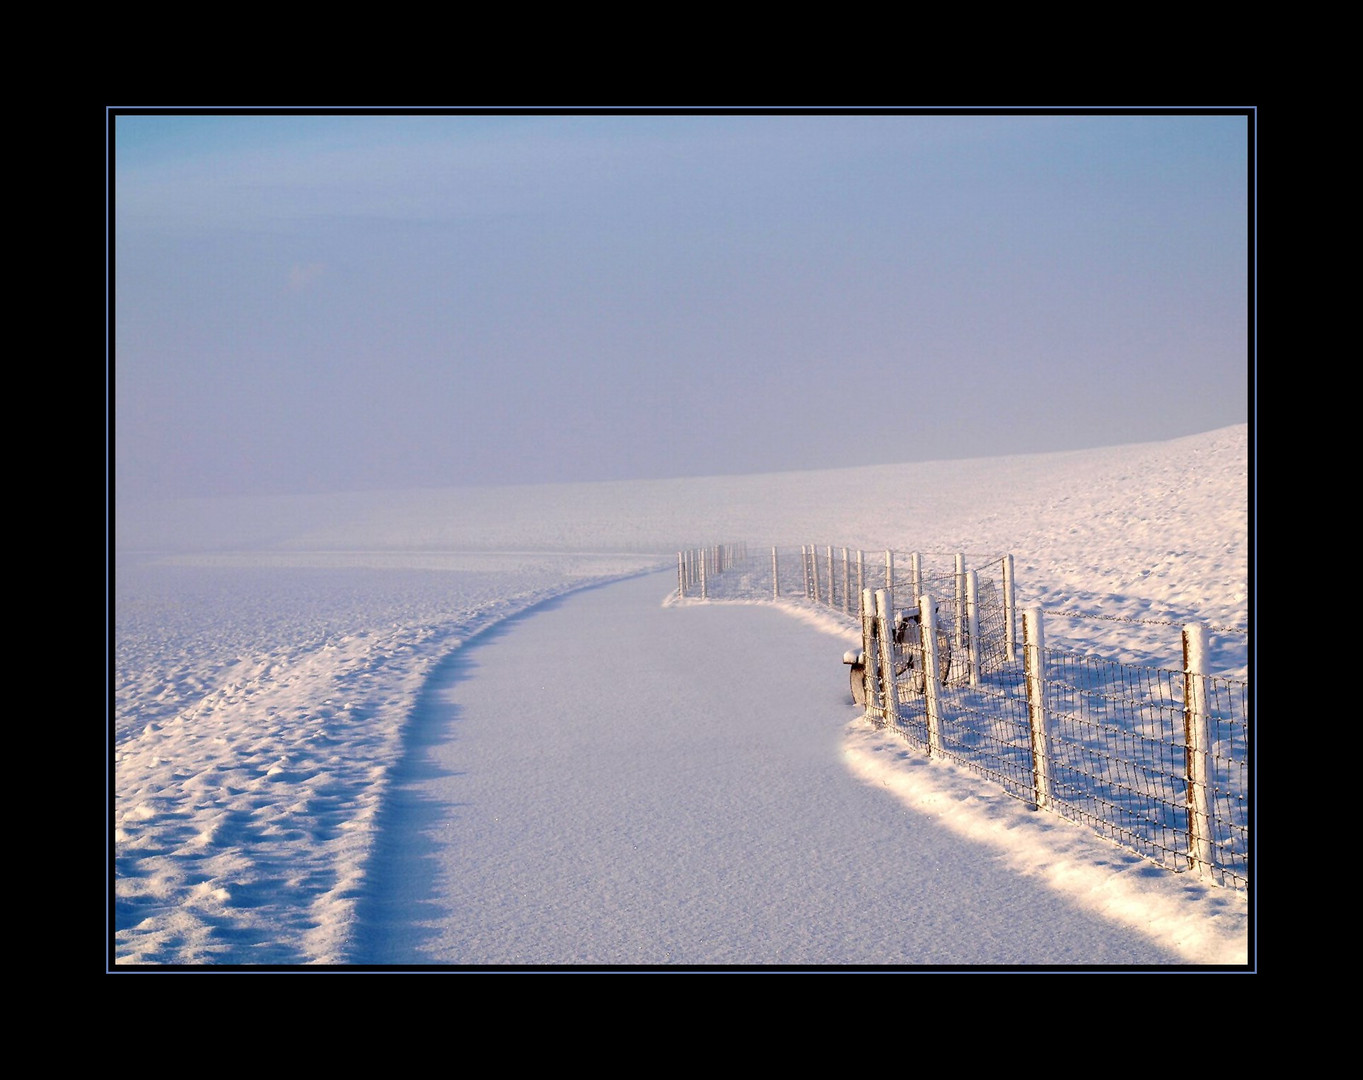 ~ Winter am Deich ~